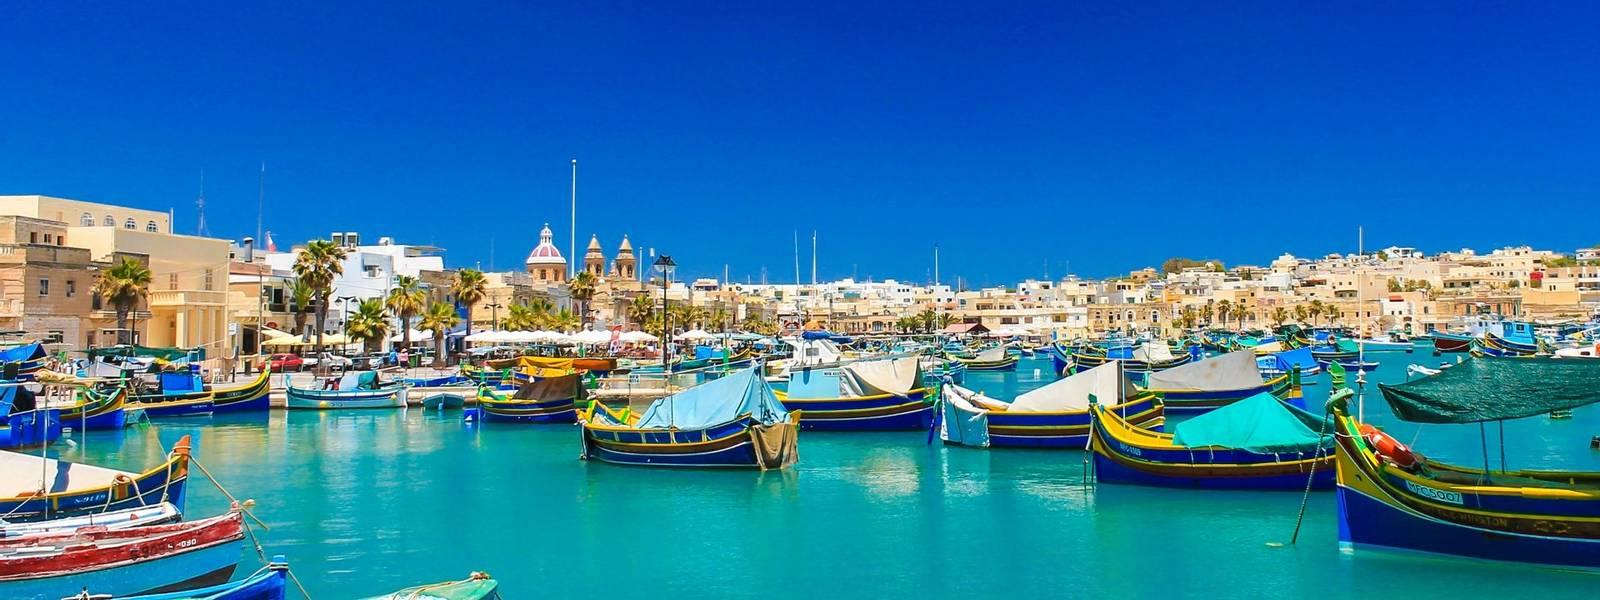 Maltese Islands - Malta - AdobeStock_57549231.jpeg